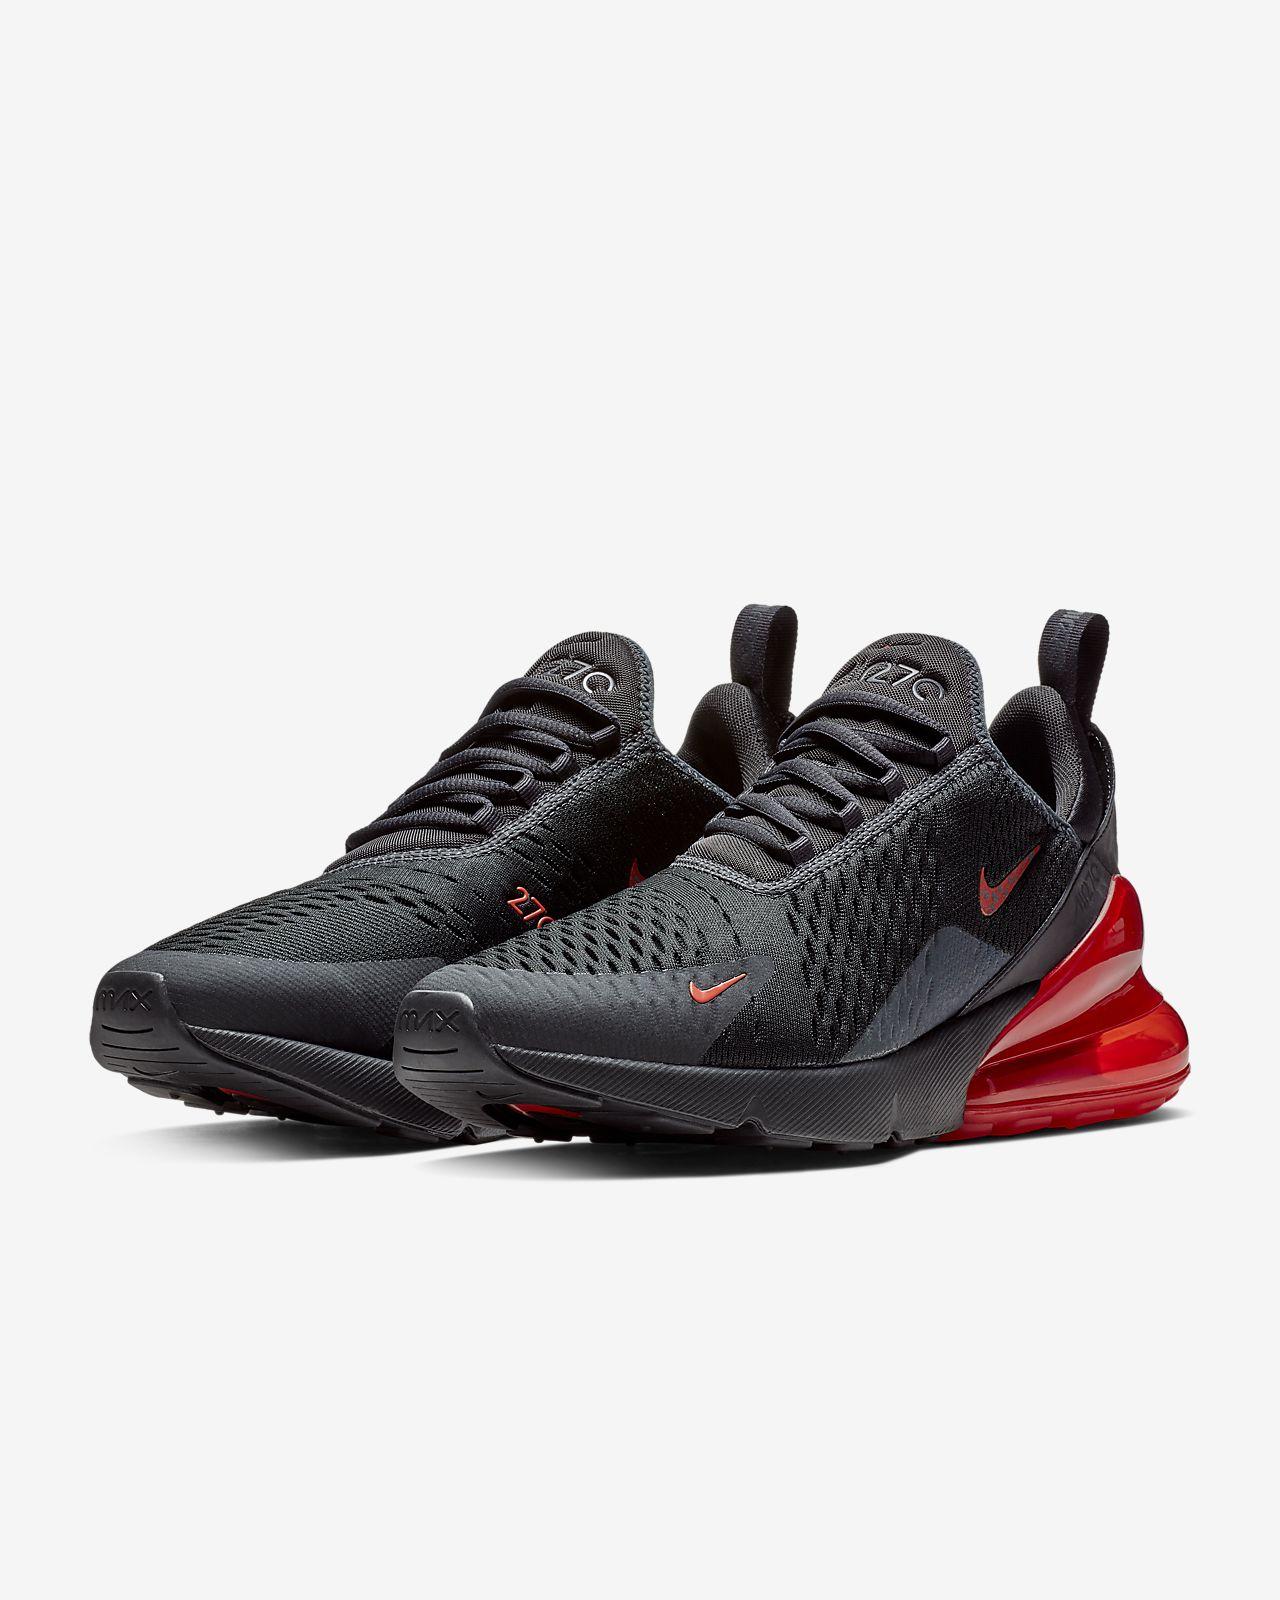 cheaper 713cd bb139 Nike Air Max 270 SE Reflective Men's Shoe